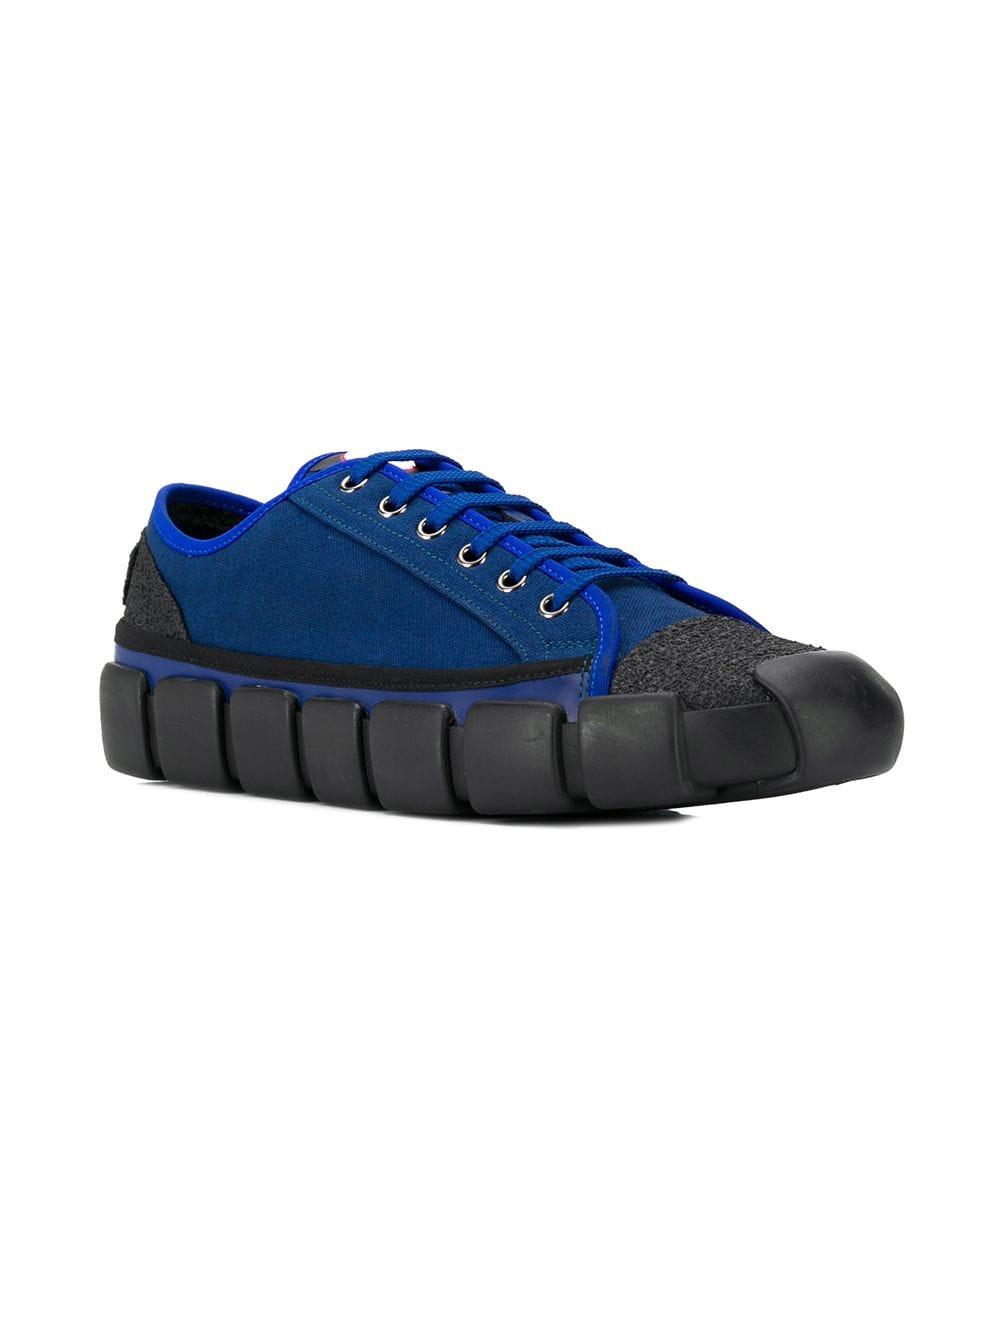 Moncler Genius x Craig Green Bradley sneakers  MONCLER GENIUS |  | 00416-00-01AGC BRADLEY736